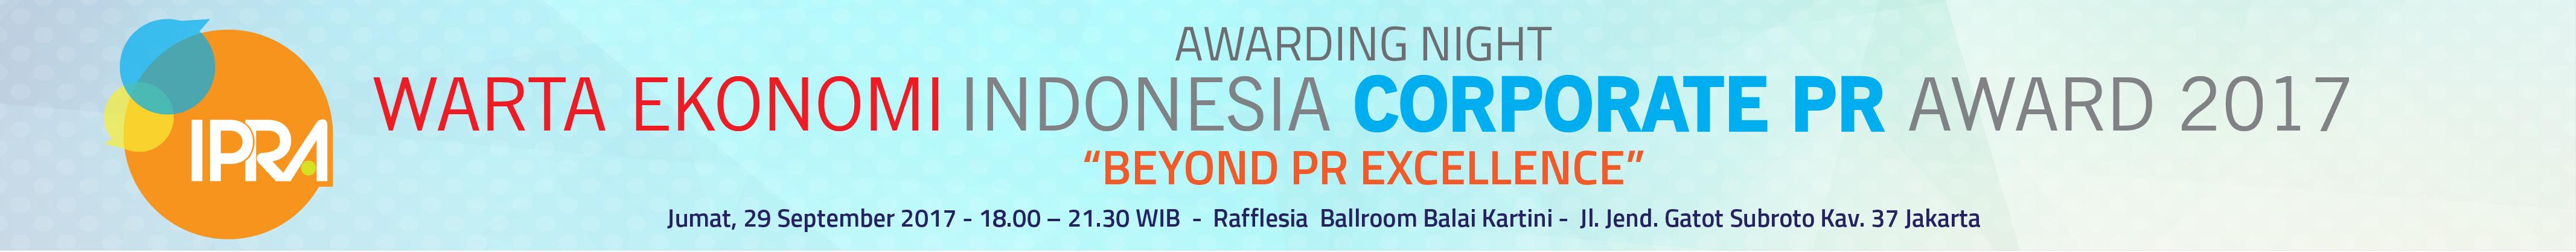 Indoesia PR Award